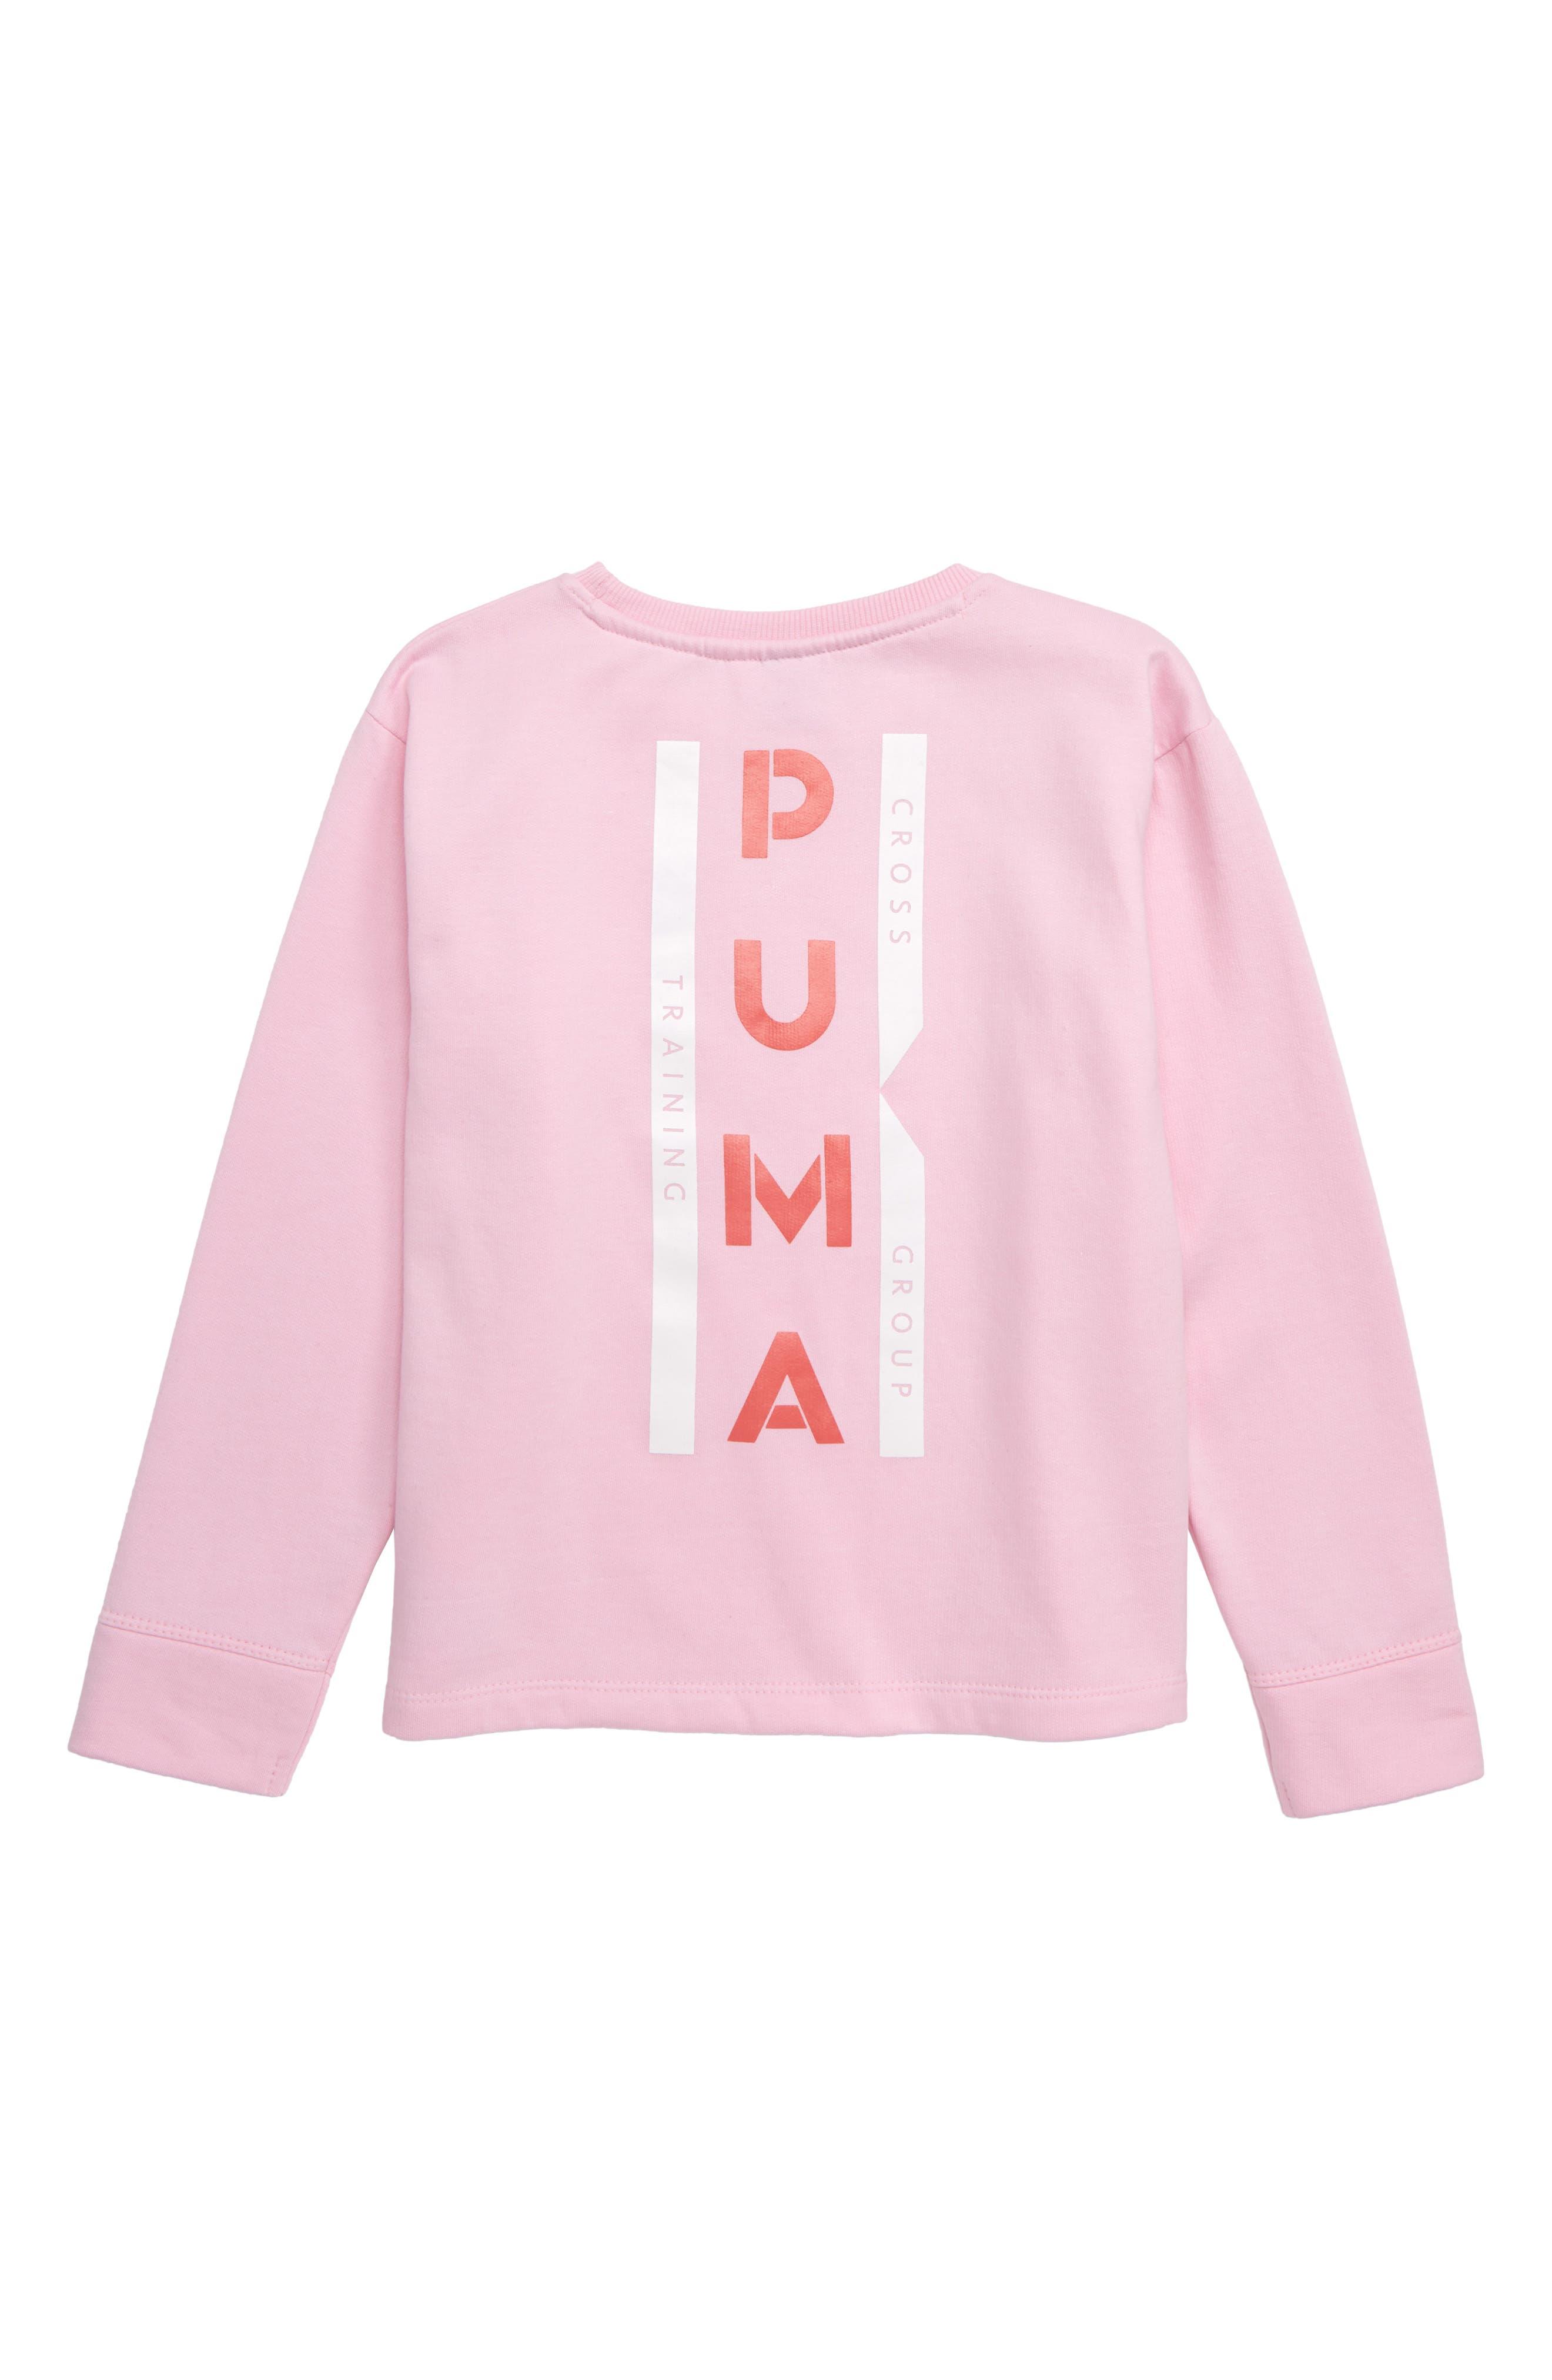 PUMA,                             Oversize Fleece Pullover,                             Alternate thumbnail 2, color,                             PALE PINK